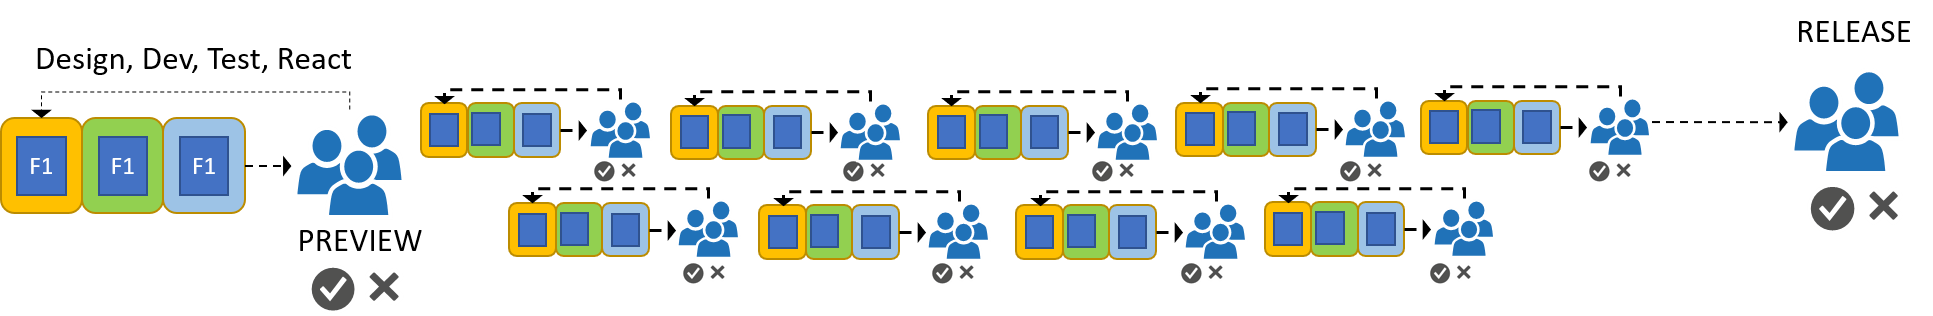 Modern software development lifecycle